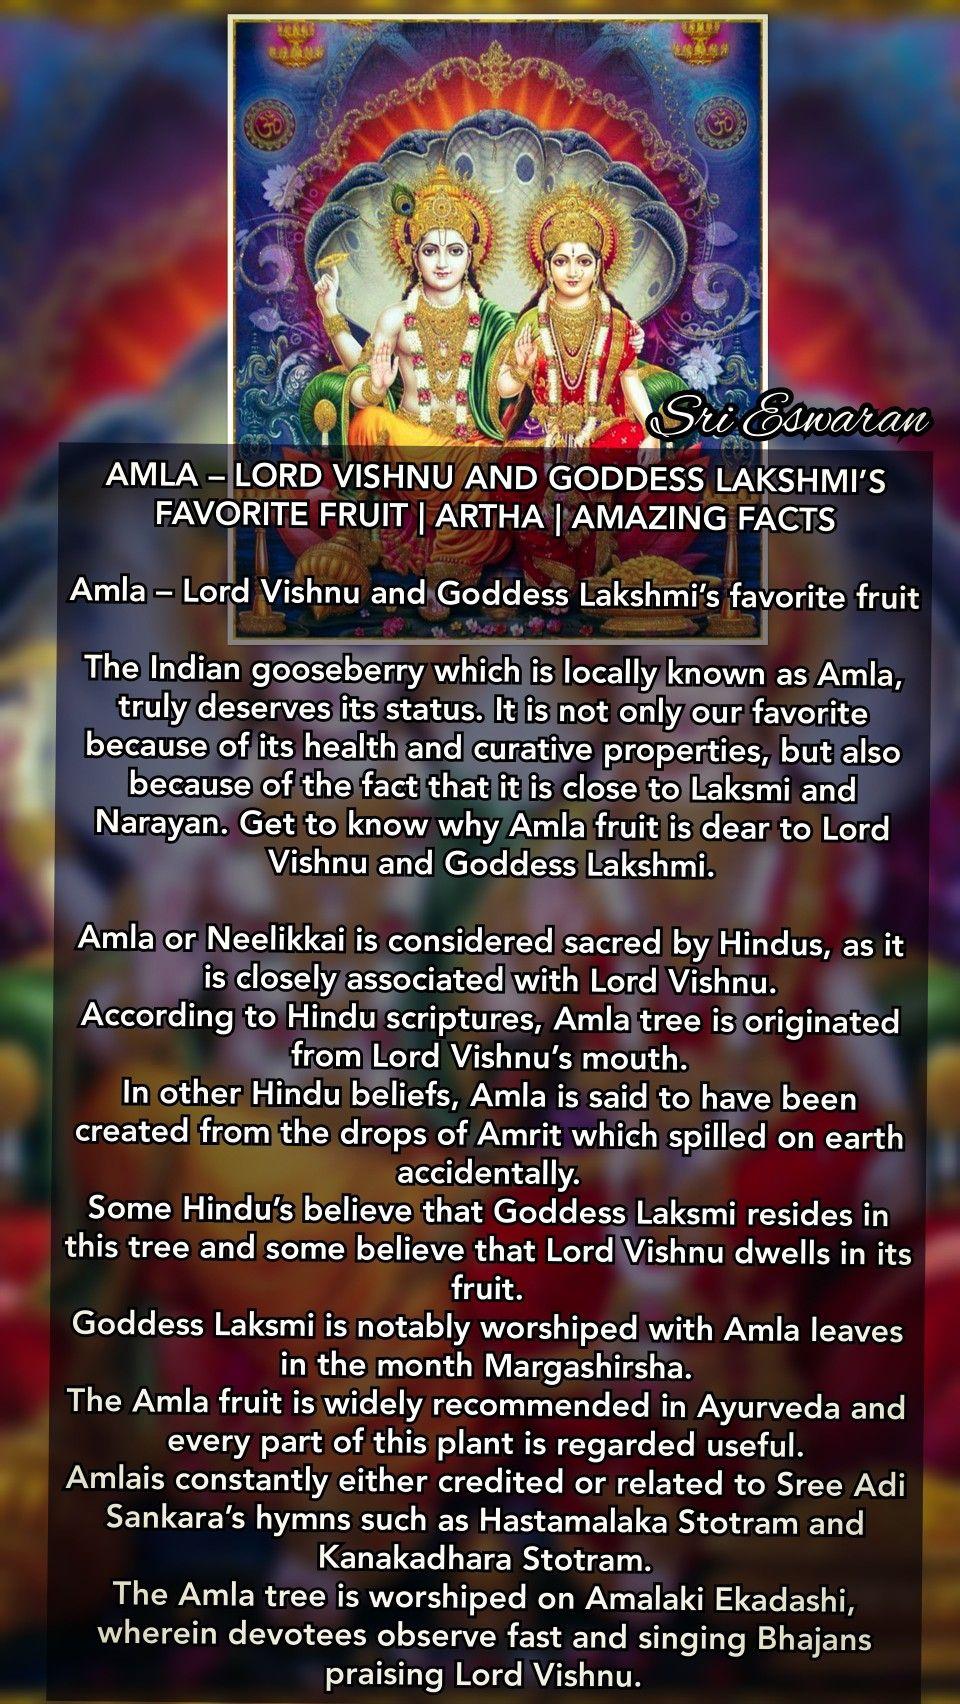 AMLA – LORD VISHNU AND GODDESS LAKSHMI'S FAVORITE FRUIT